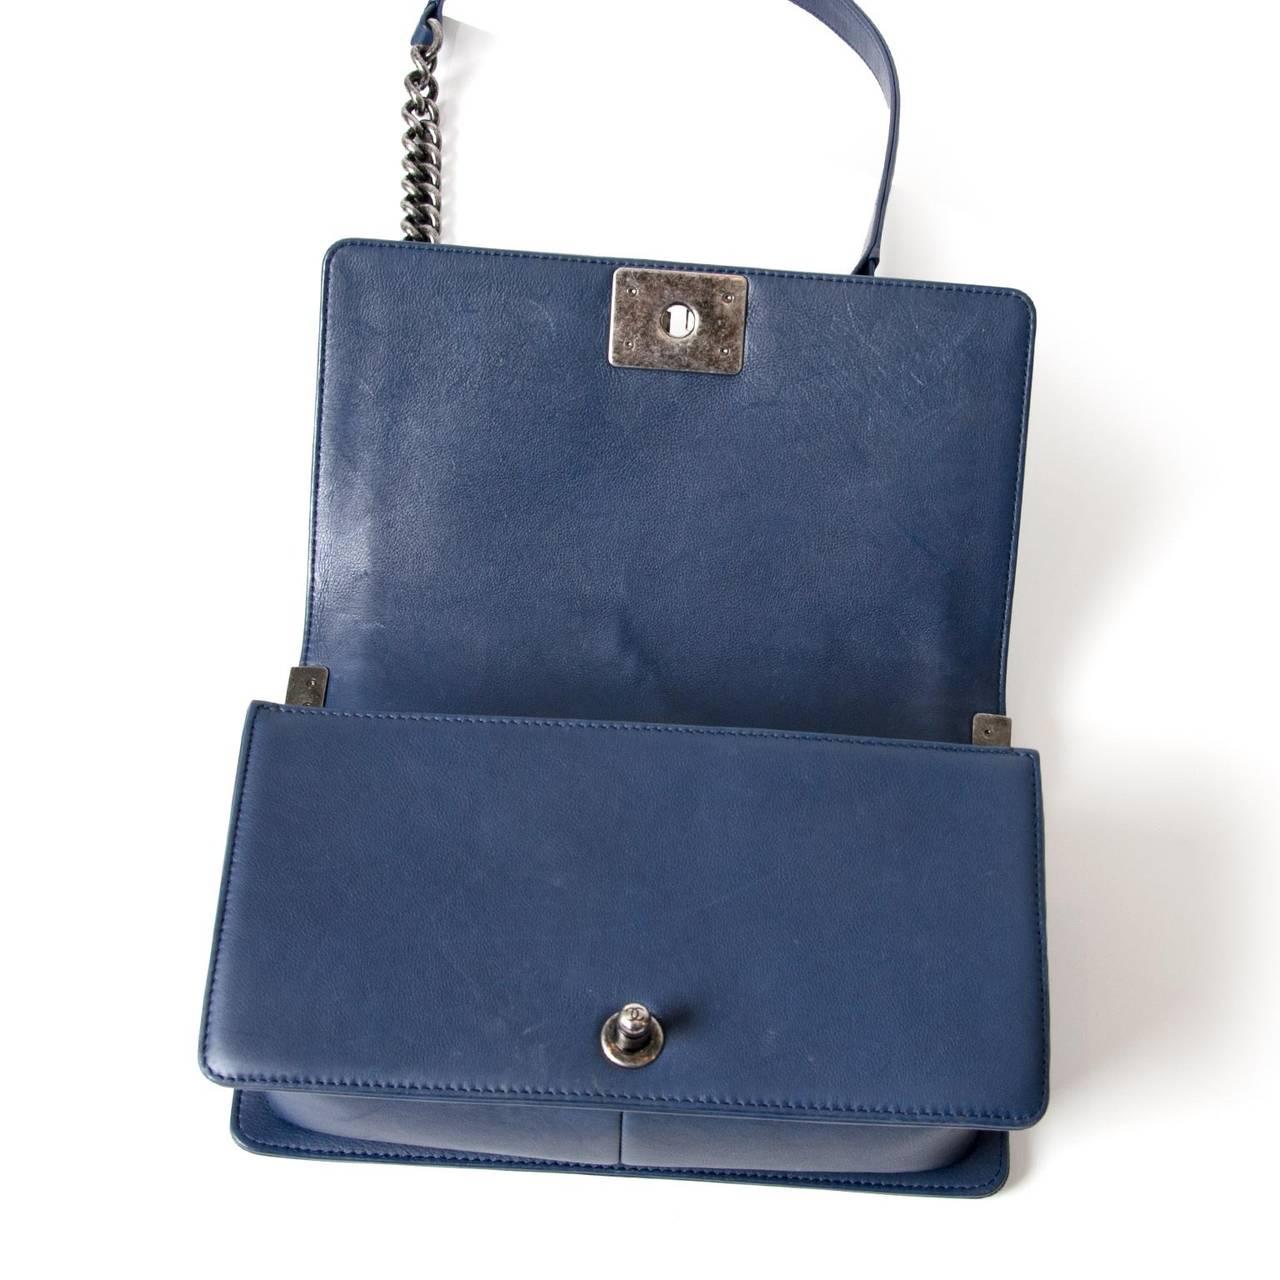 Chanel Lambskin Medium Quilted Boy Bag 7